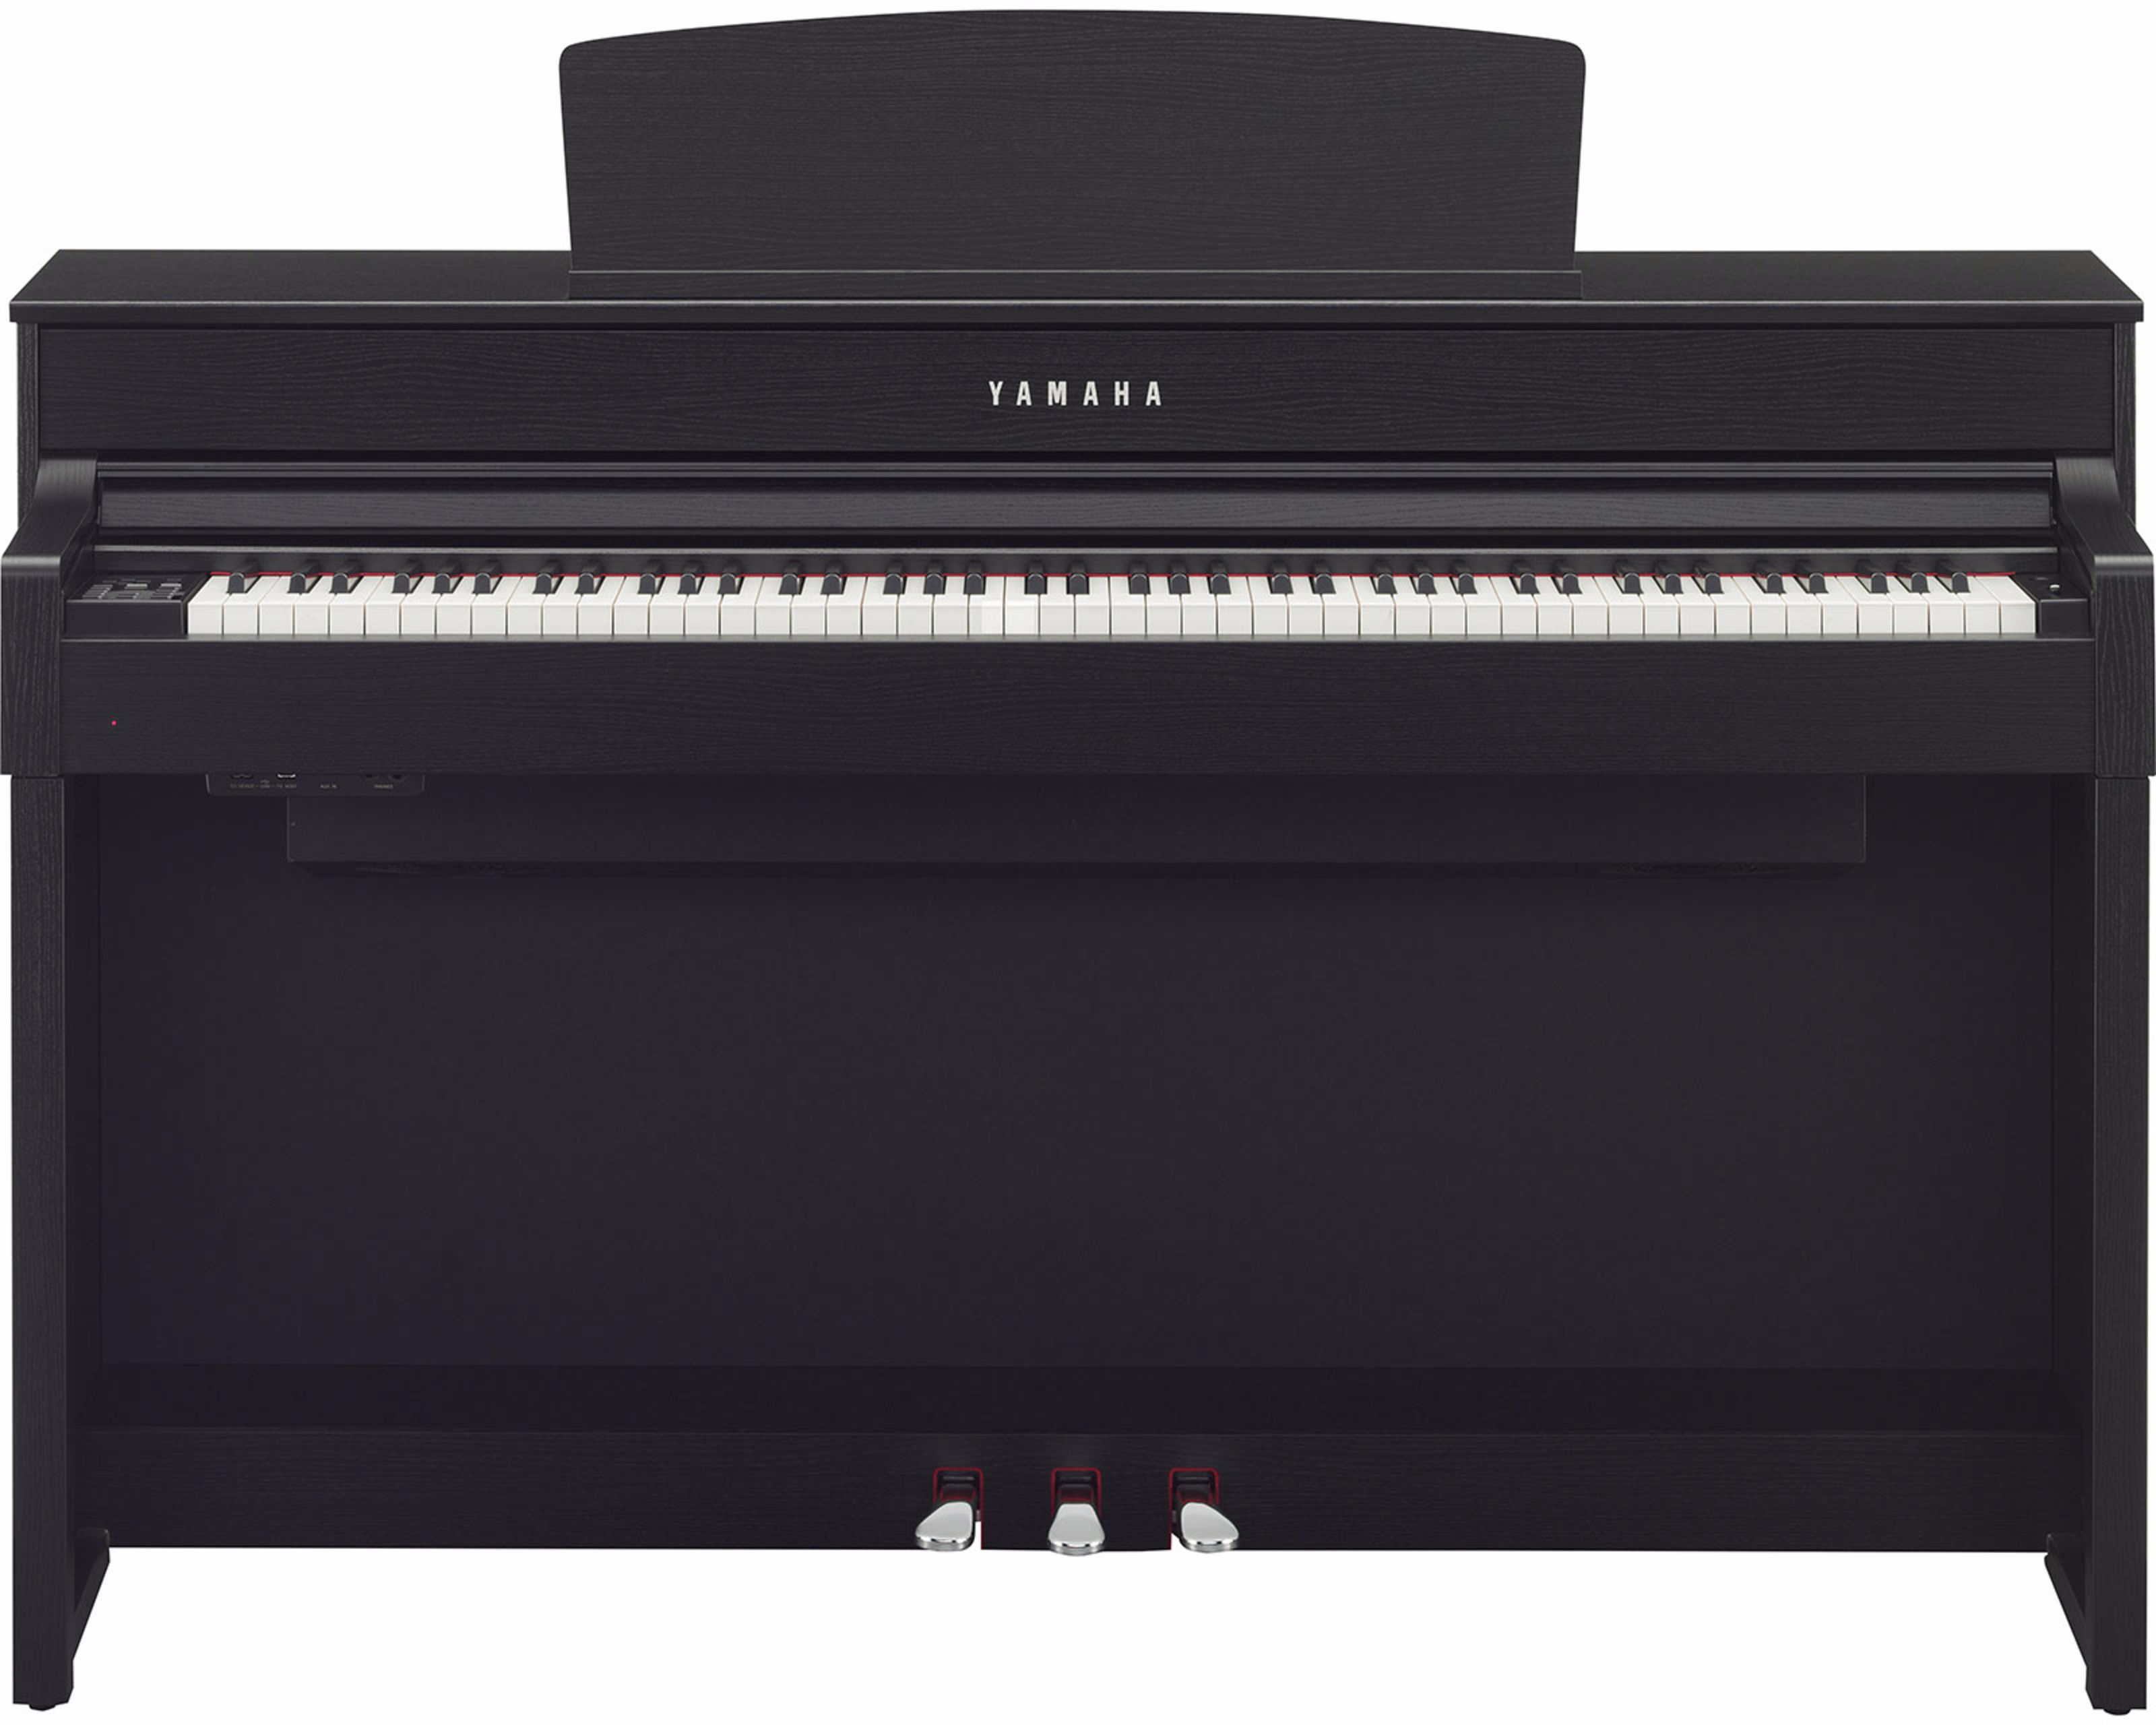 yamaha clavinova clp 575 b digital piano black. Black Bedroom Furniture Sets. Home Design Ideas